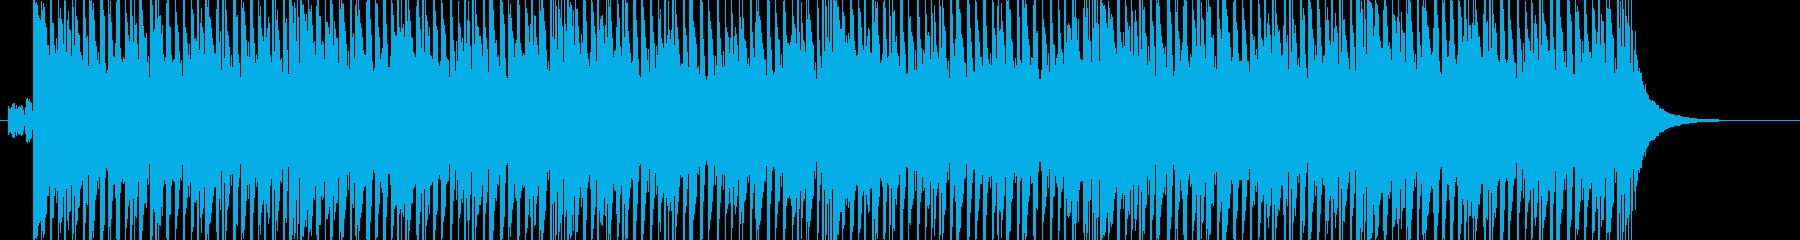 CMや映像、ハッピーなウクレレ、口笛2aの再生済みの波形